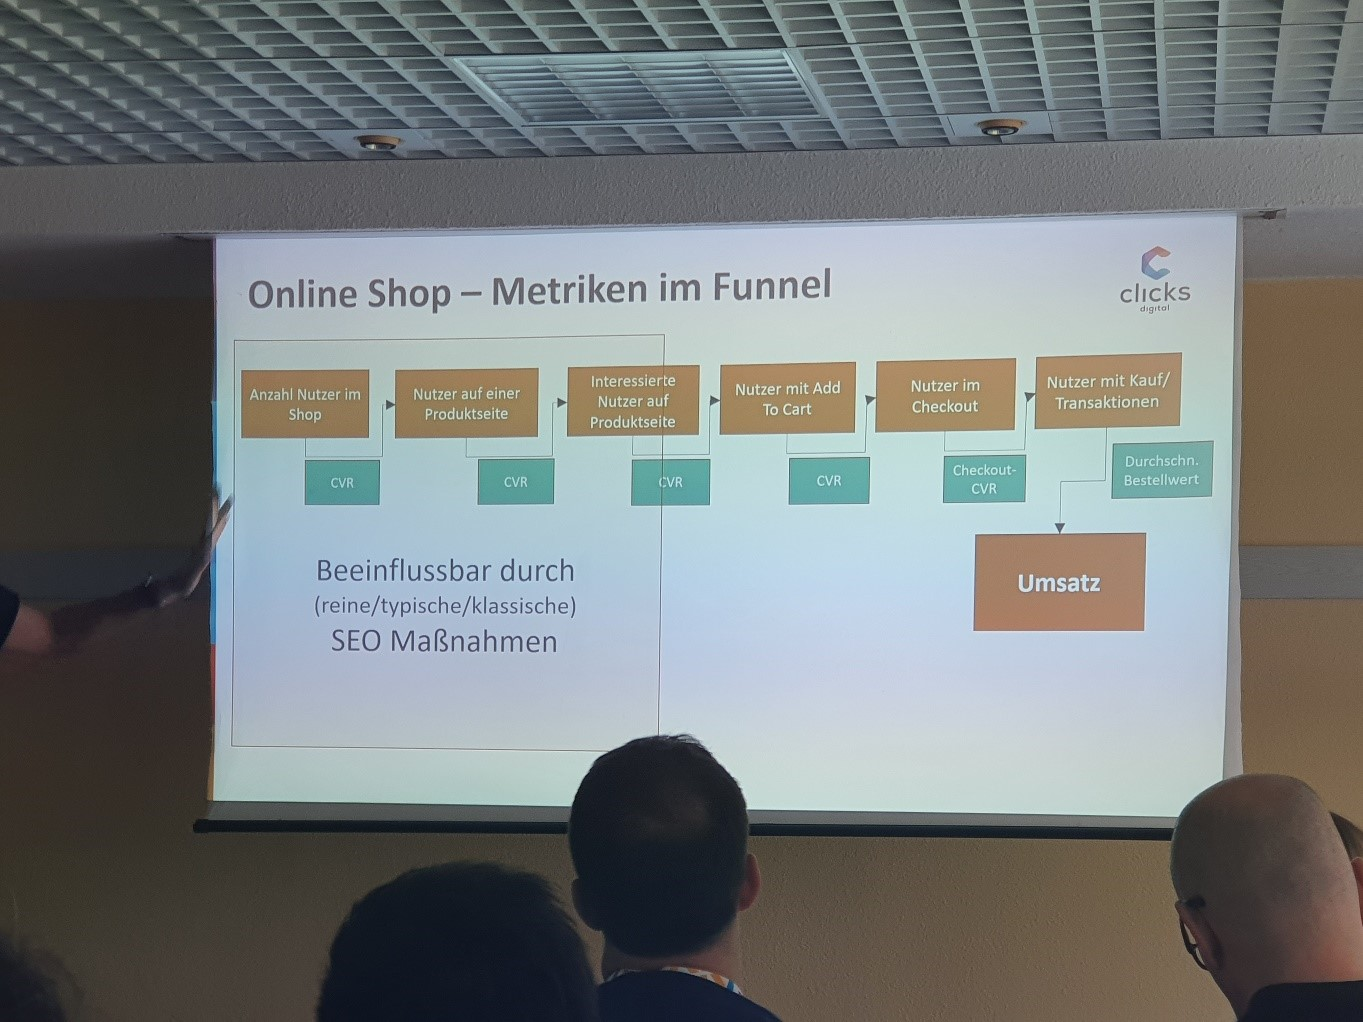 Online-Shop-metriken-im-Funnel